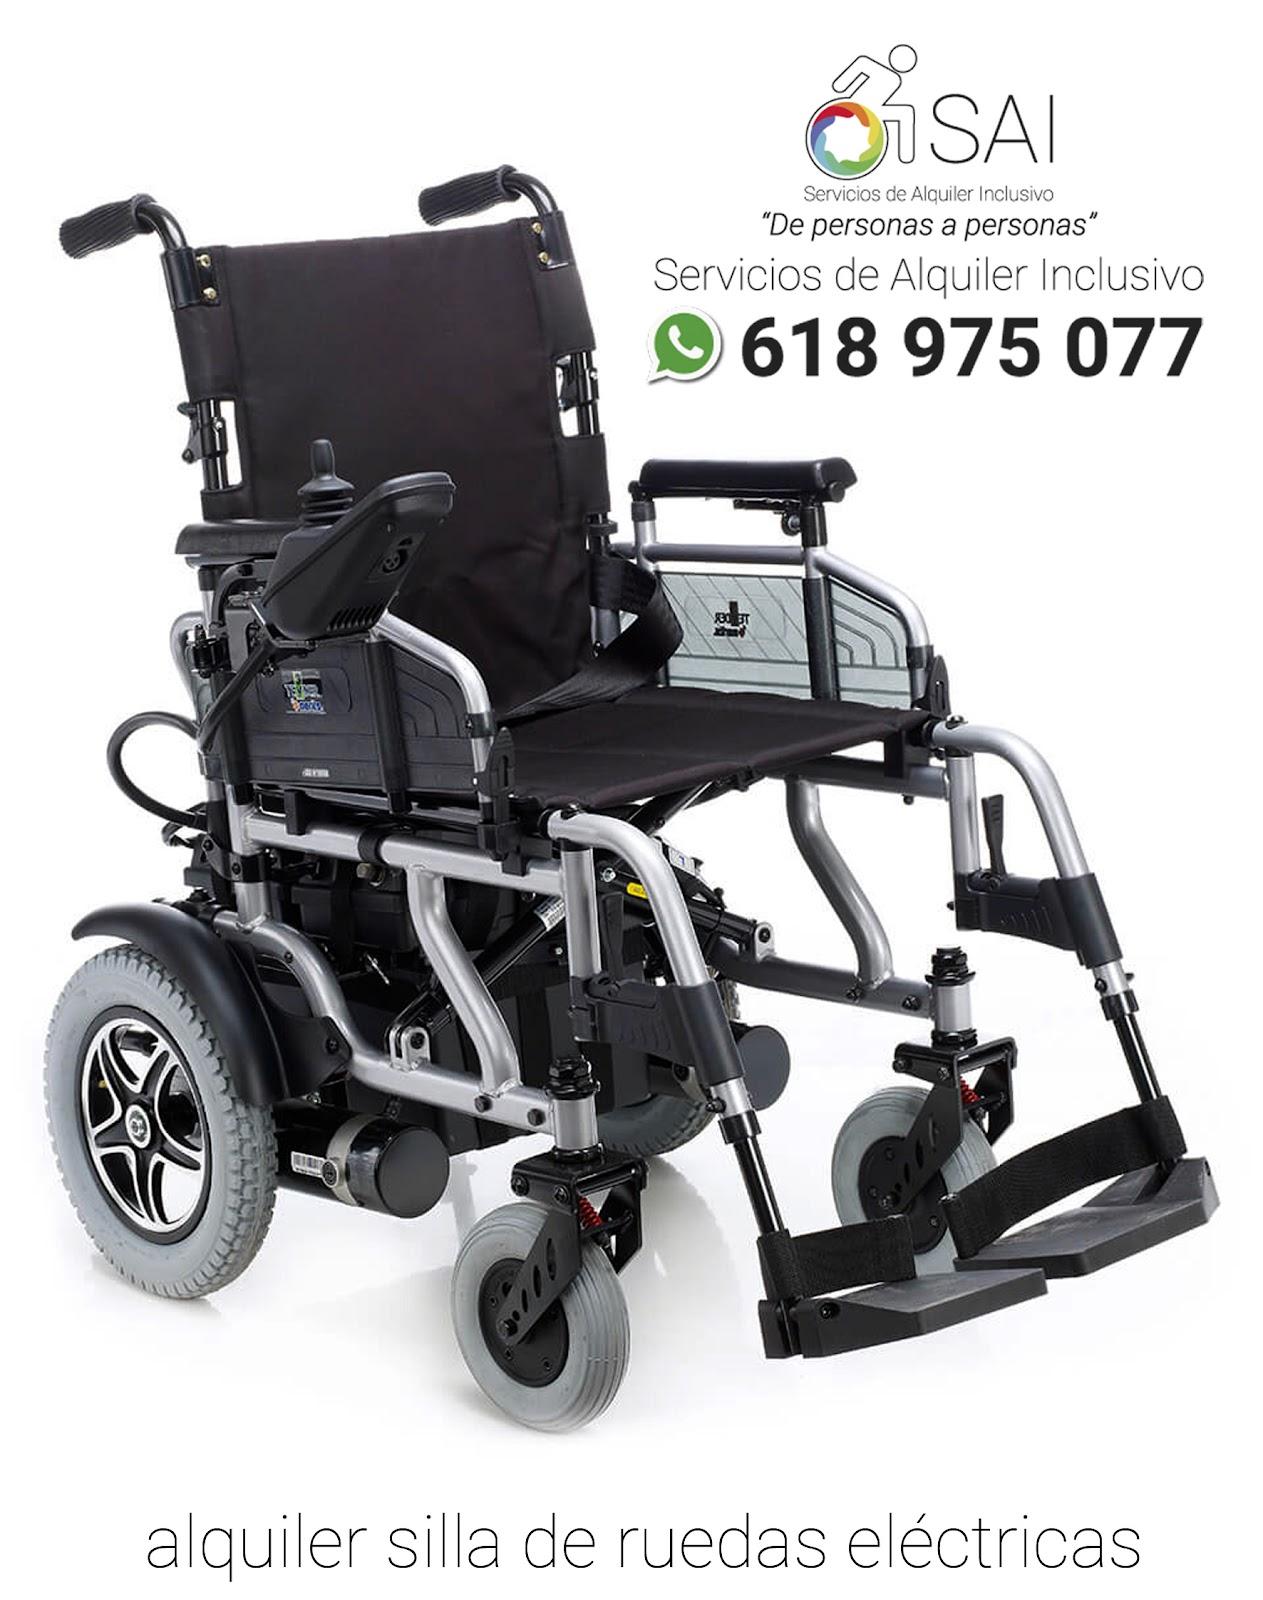 Servicios alquiler inclusivo barcelona alquiler sillas de for Sillas para rentar